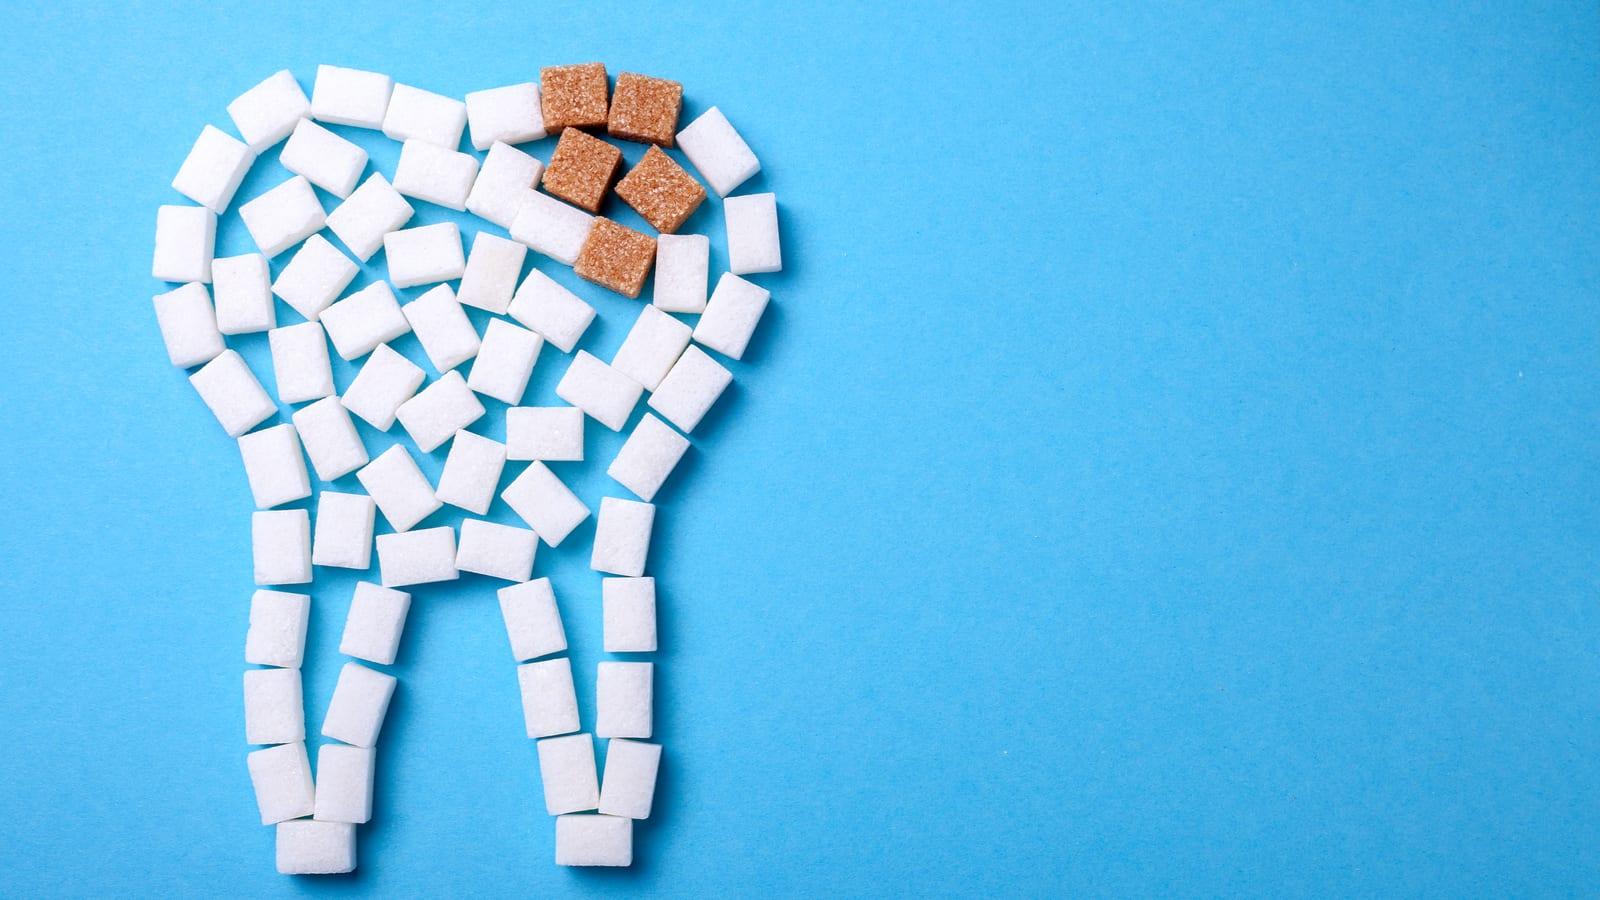 Sugar Cube Teeth With Brown Sugar Decay Cubes